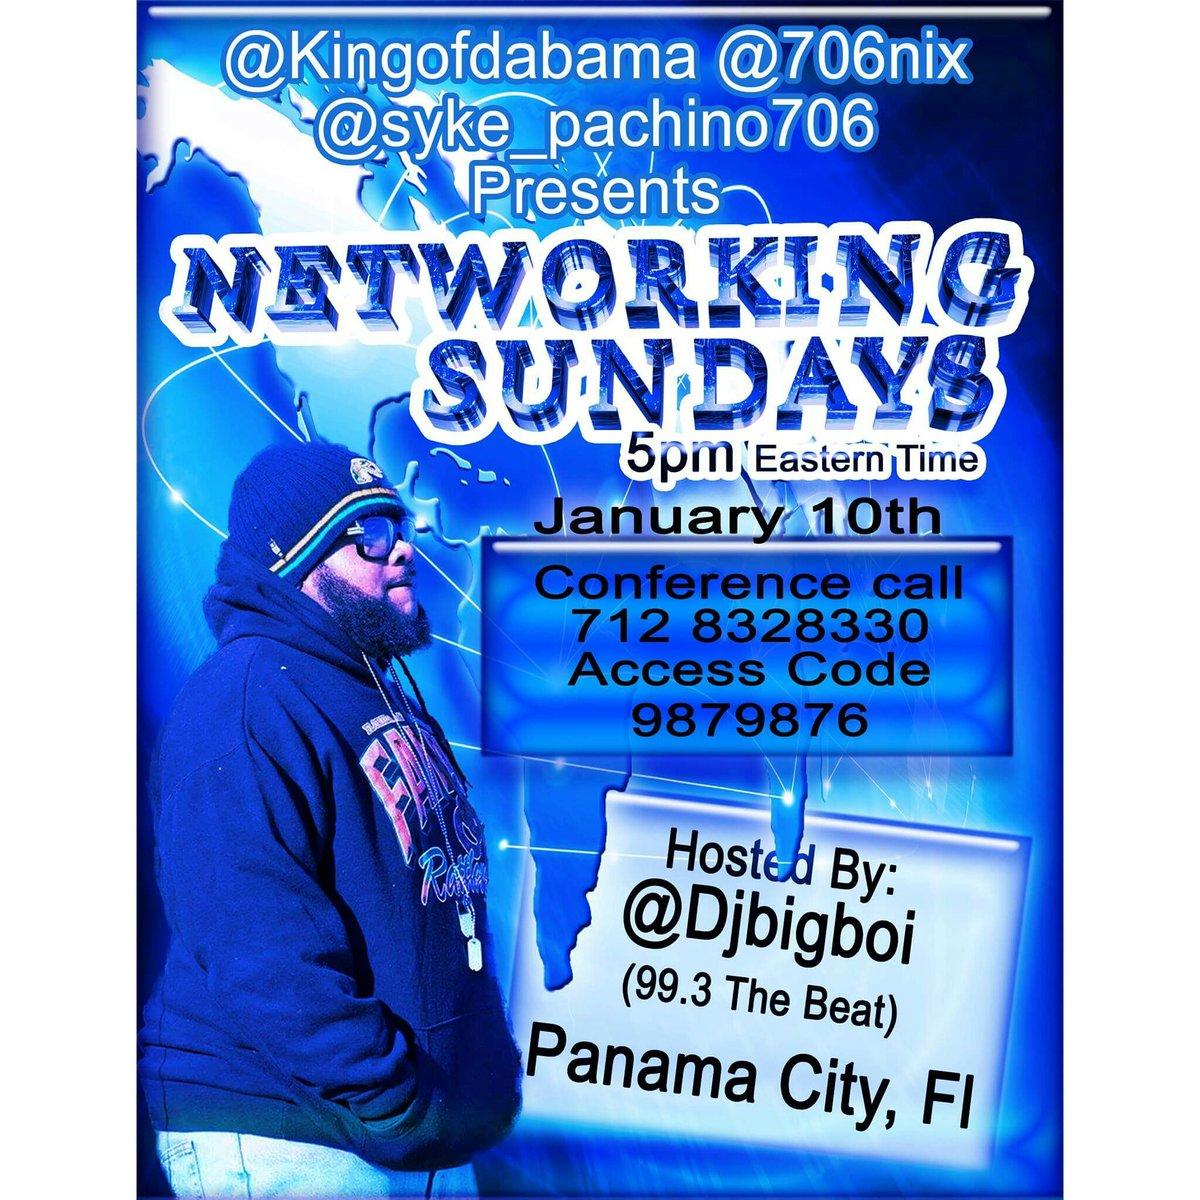 @Kingofdabama @706nix @syke_pachino706 Presents Networking Sundays Hosted By @Djbigboi (99.3 The Beat) Panama City https://t.co/krI4Hr9WWz